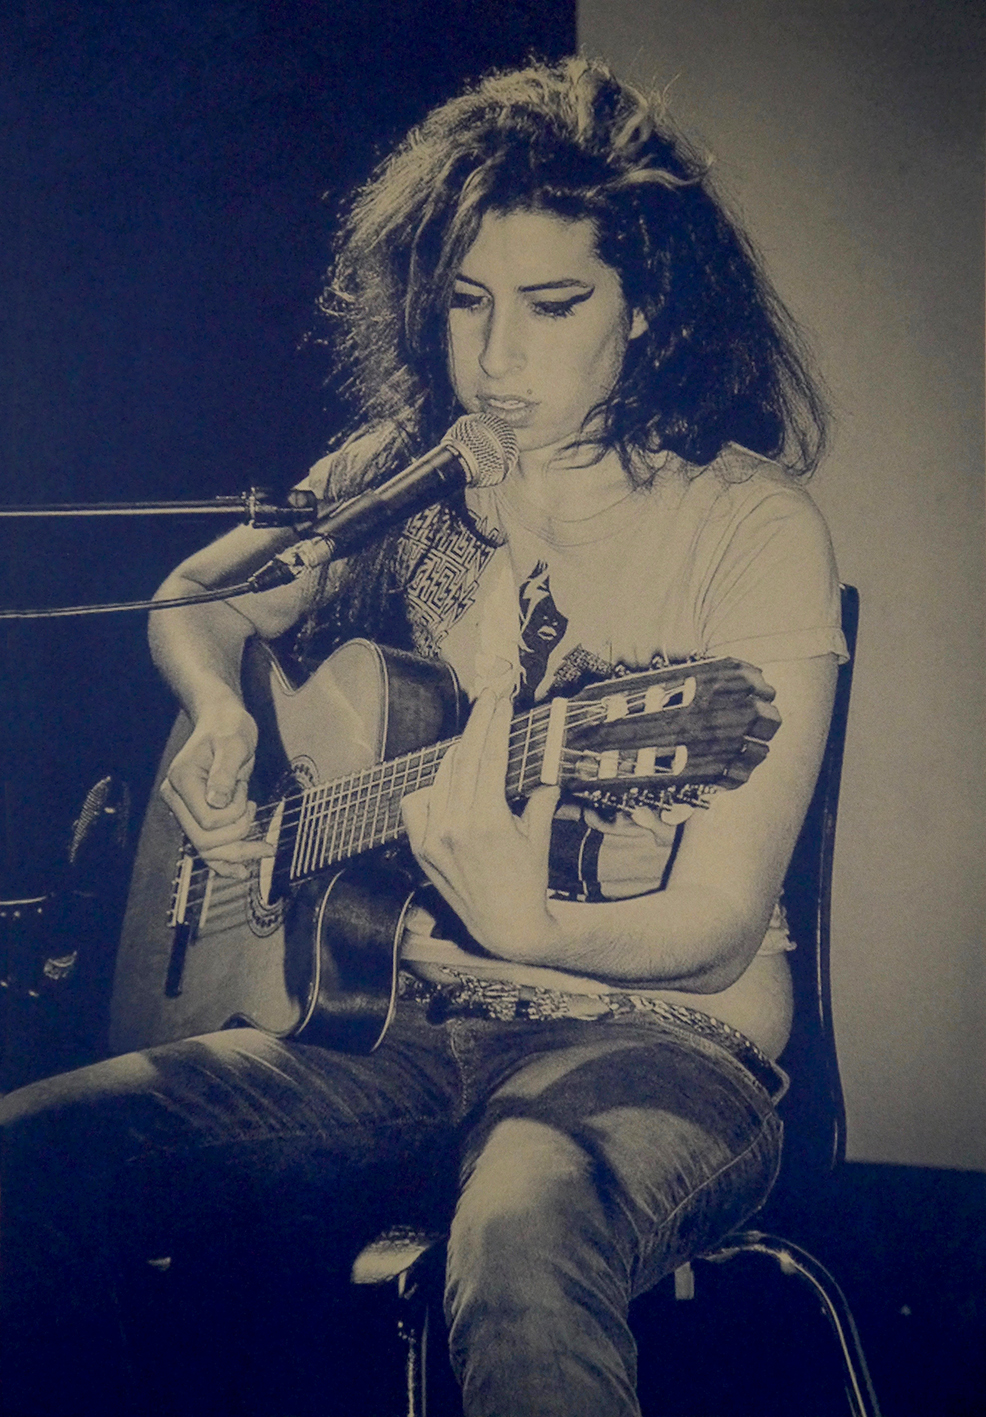 Amy Winehouse I, II and III